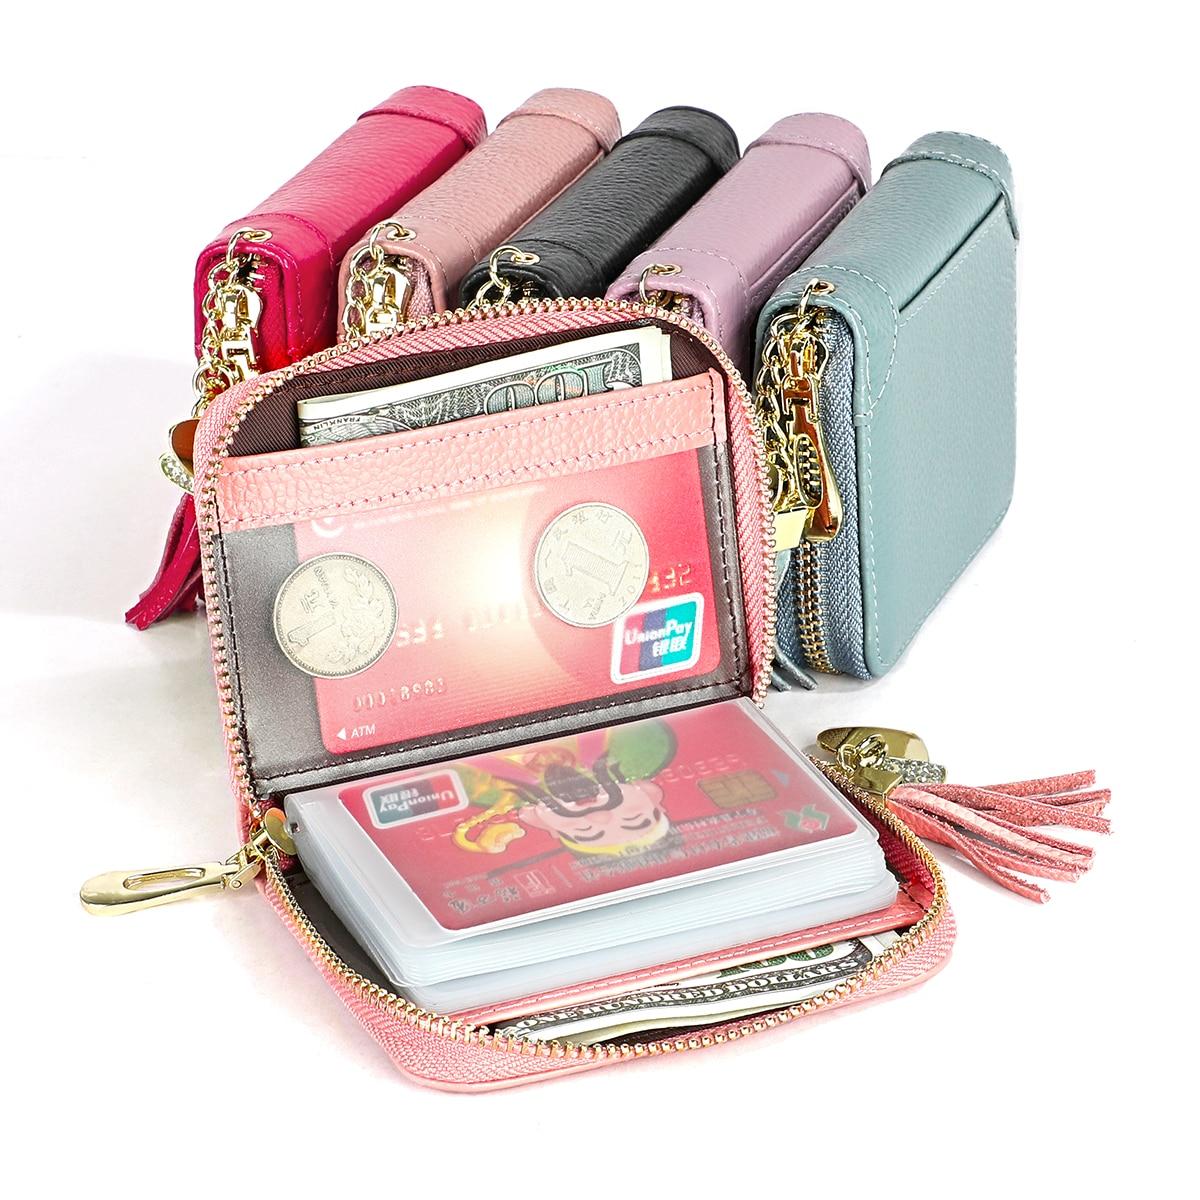 Luxury Split Leather Tassel Credit Card Holders  RFID Card Holder Wallet Women Business Cardholder Organizer Female Purse